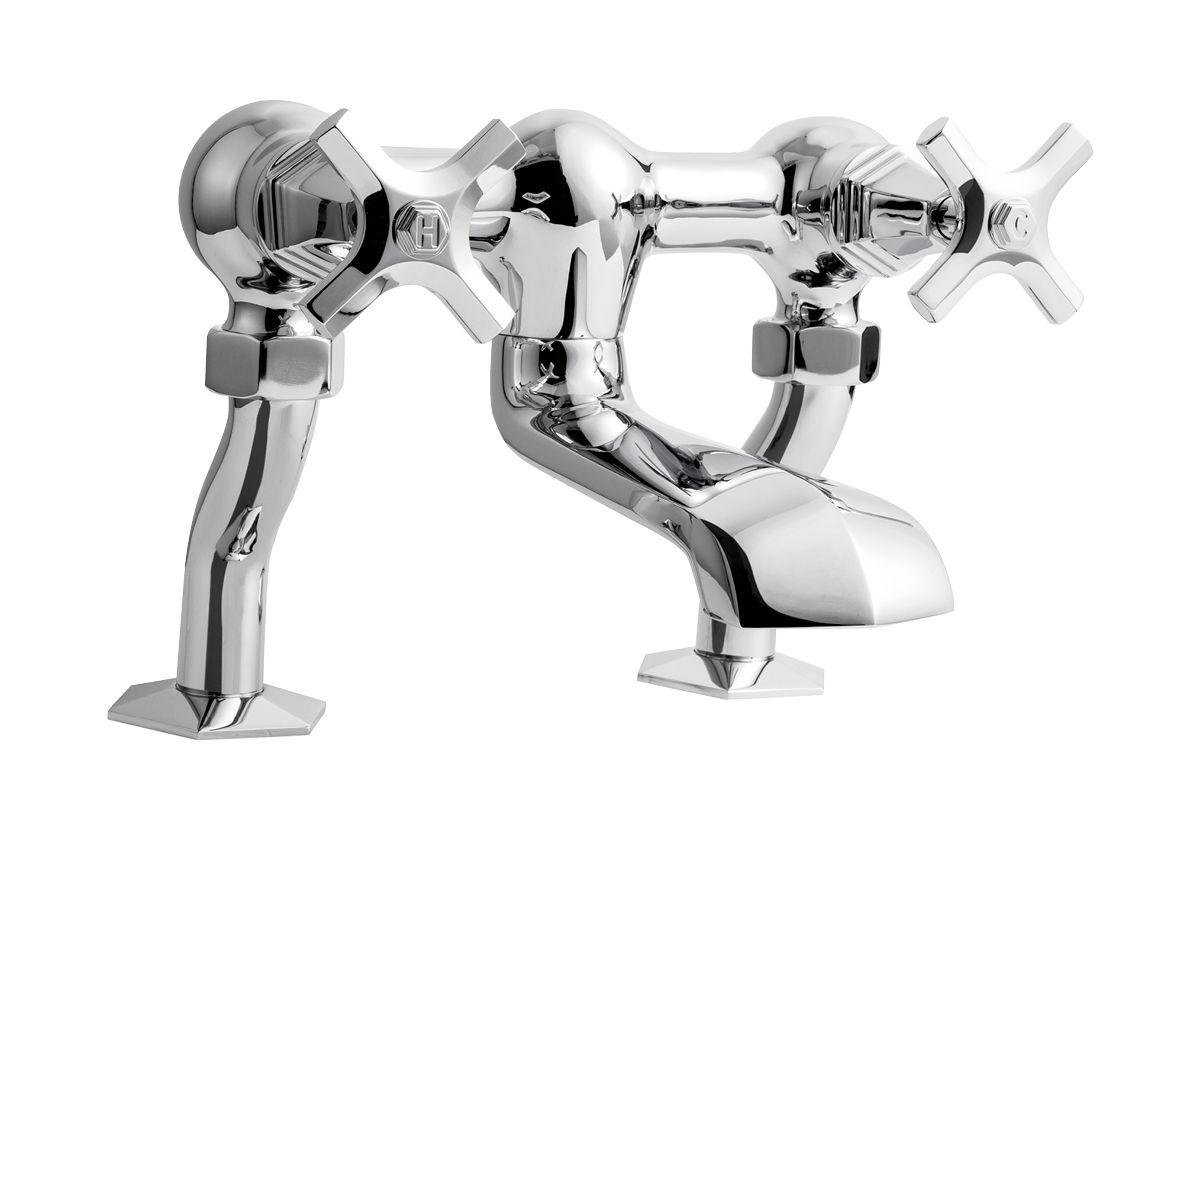 Waldorf Crosshead Lever Exposed 2 Handle Tub Faucet in Waldorf | Luxury bathrooms, Crosswater Bathrooms USA